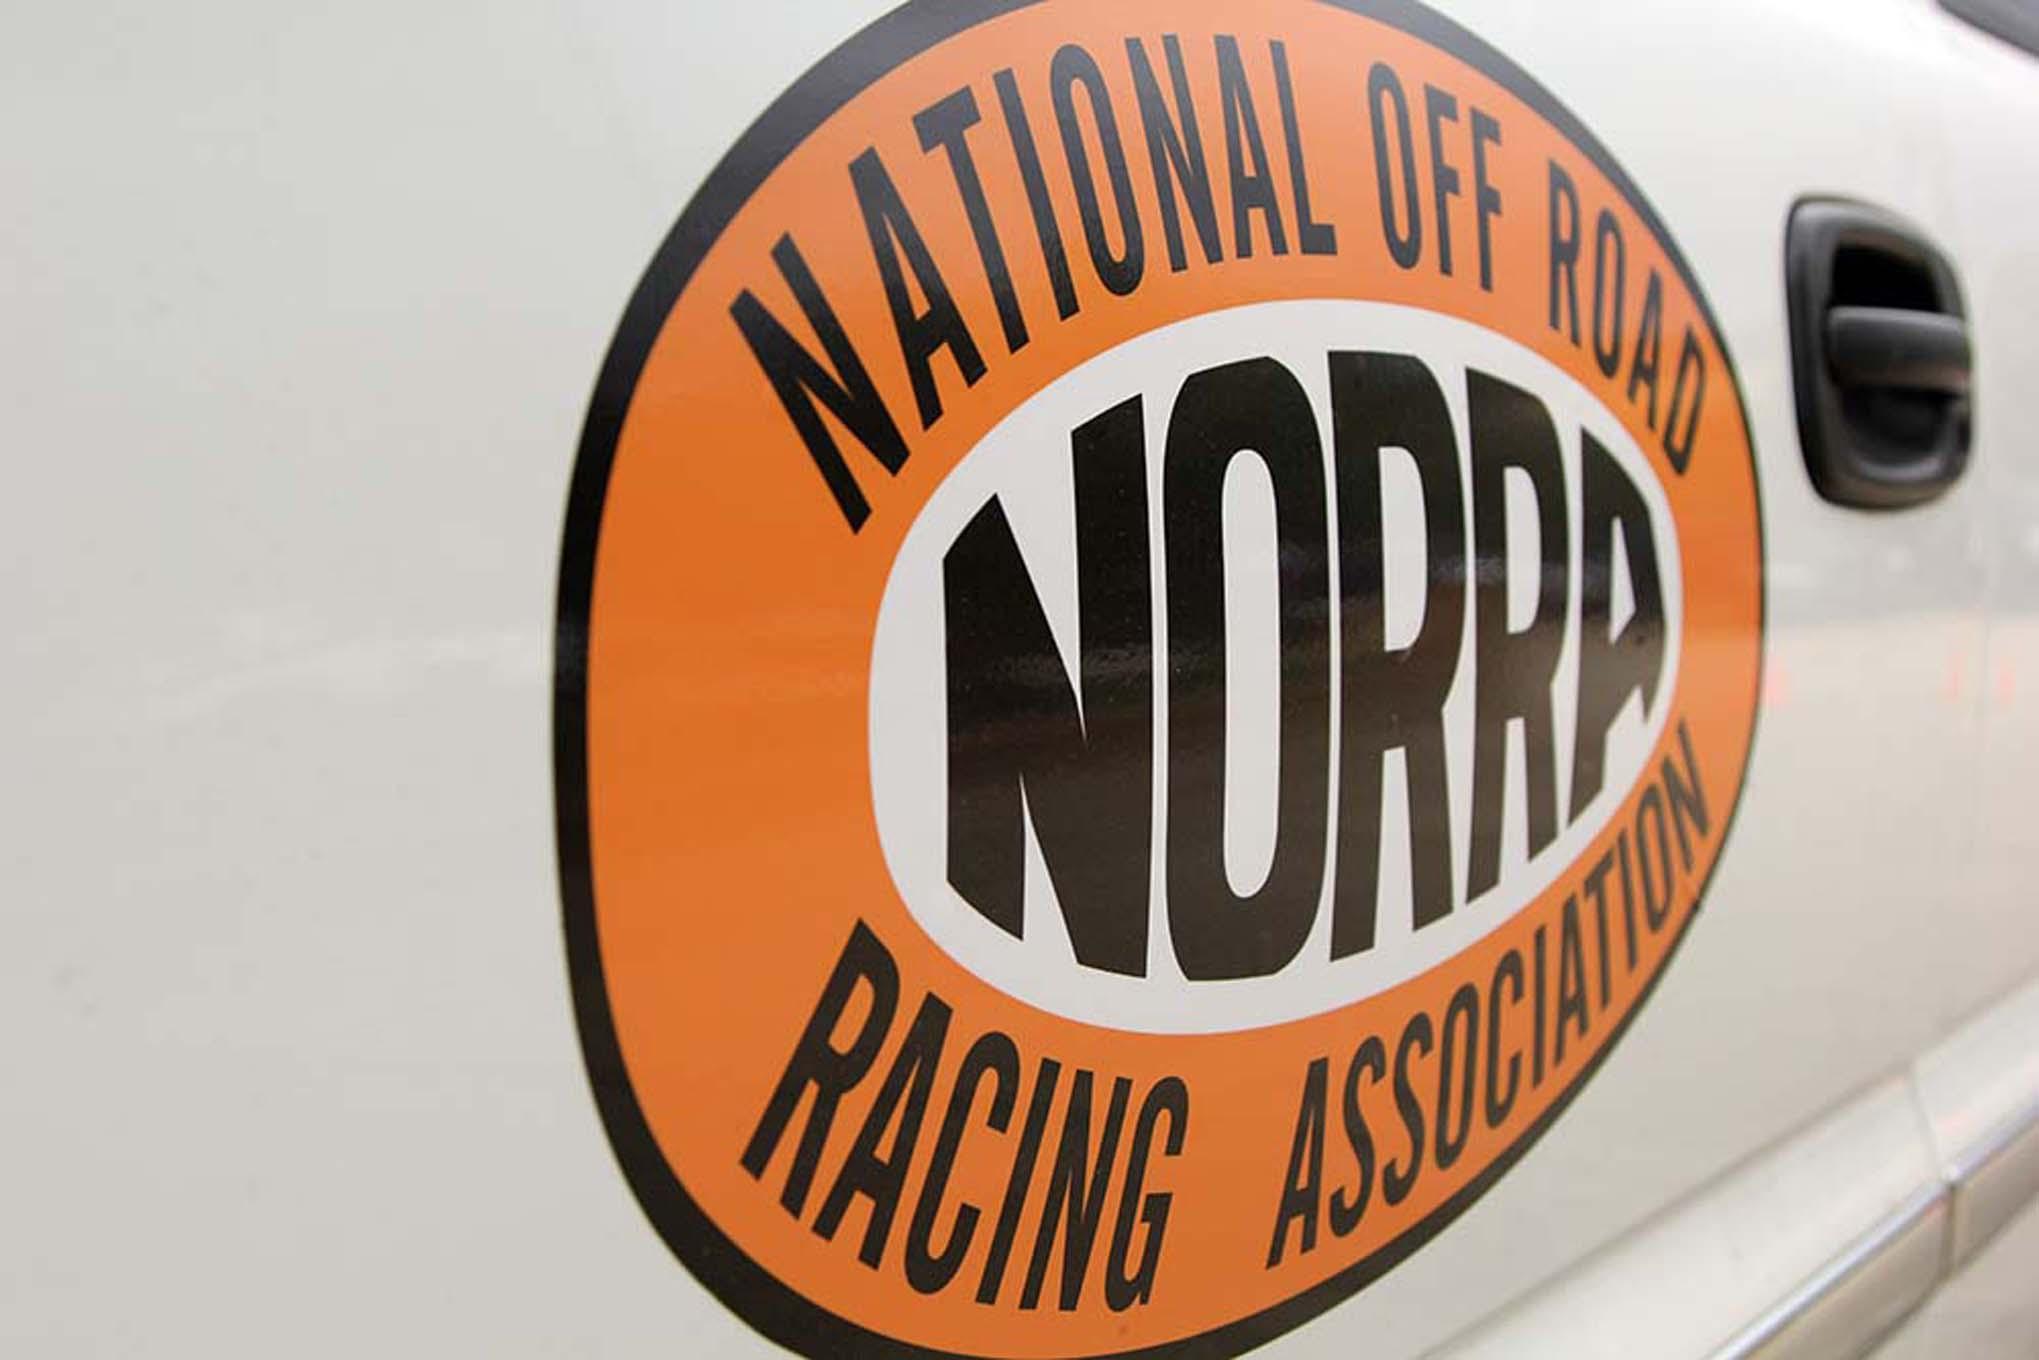 053NORRA Mexican 1000 BAJA offroad Race 2015 Manx Nova Chevy James Garner